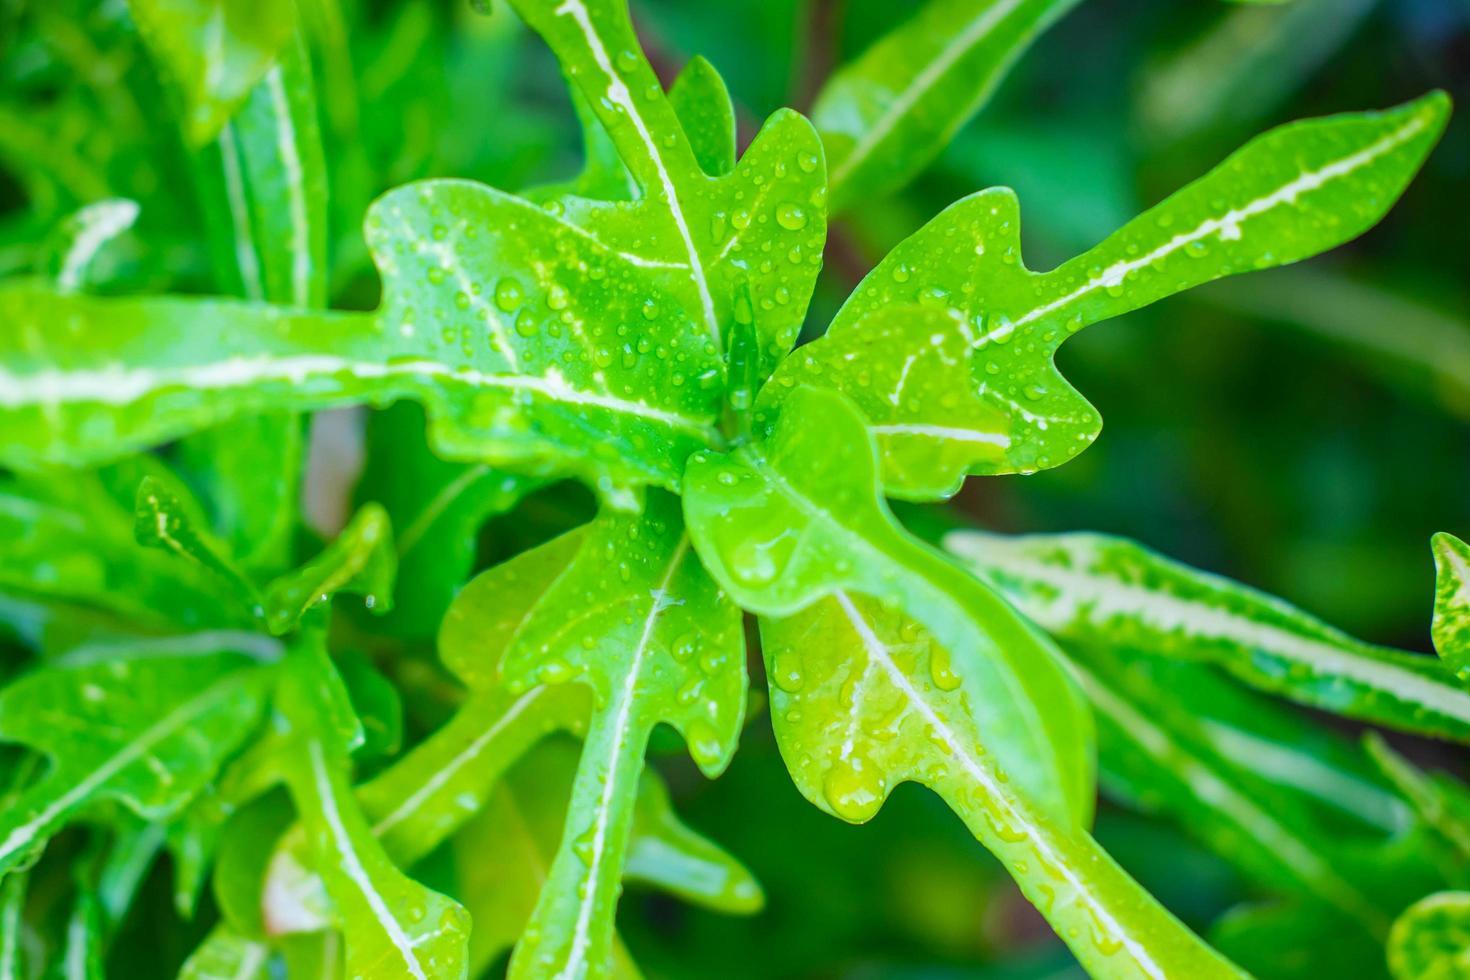 vattendroppar på bladen under regnperioden foto